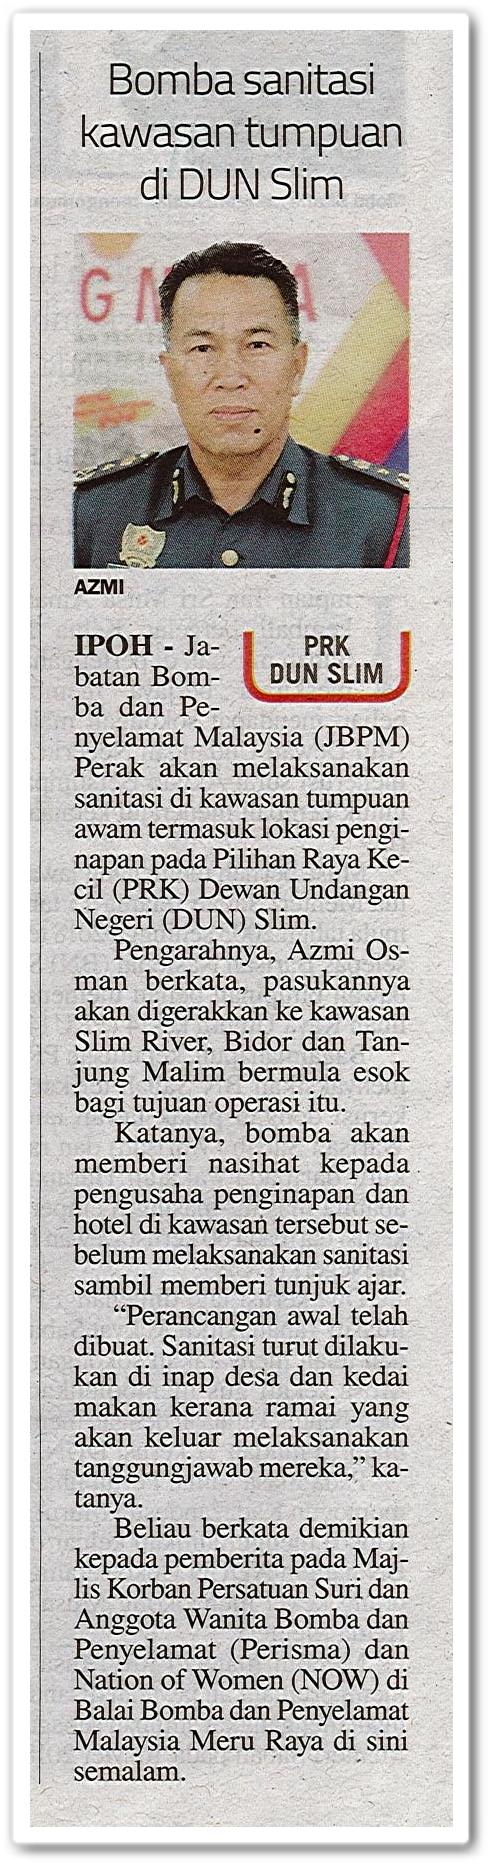 Bomba sanitasi kawasan tumpuan di DUN Slim - Keratan akhbar Sinar Harian 2 Ogos 2020